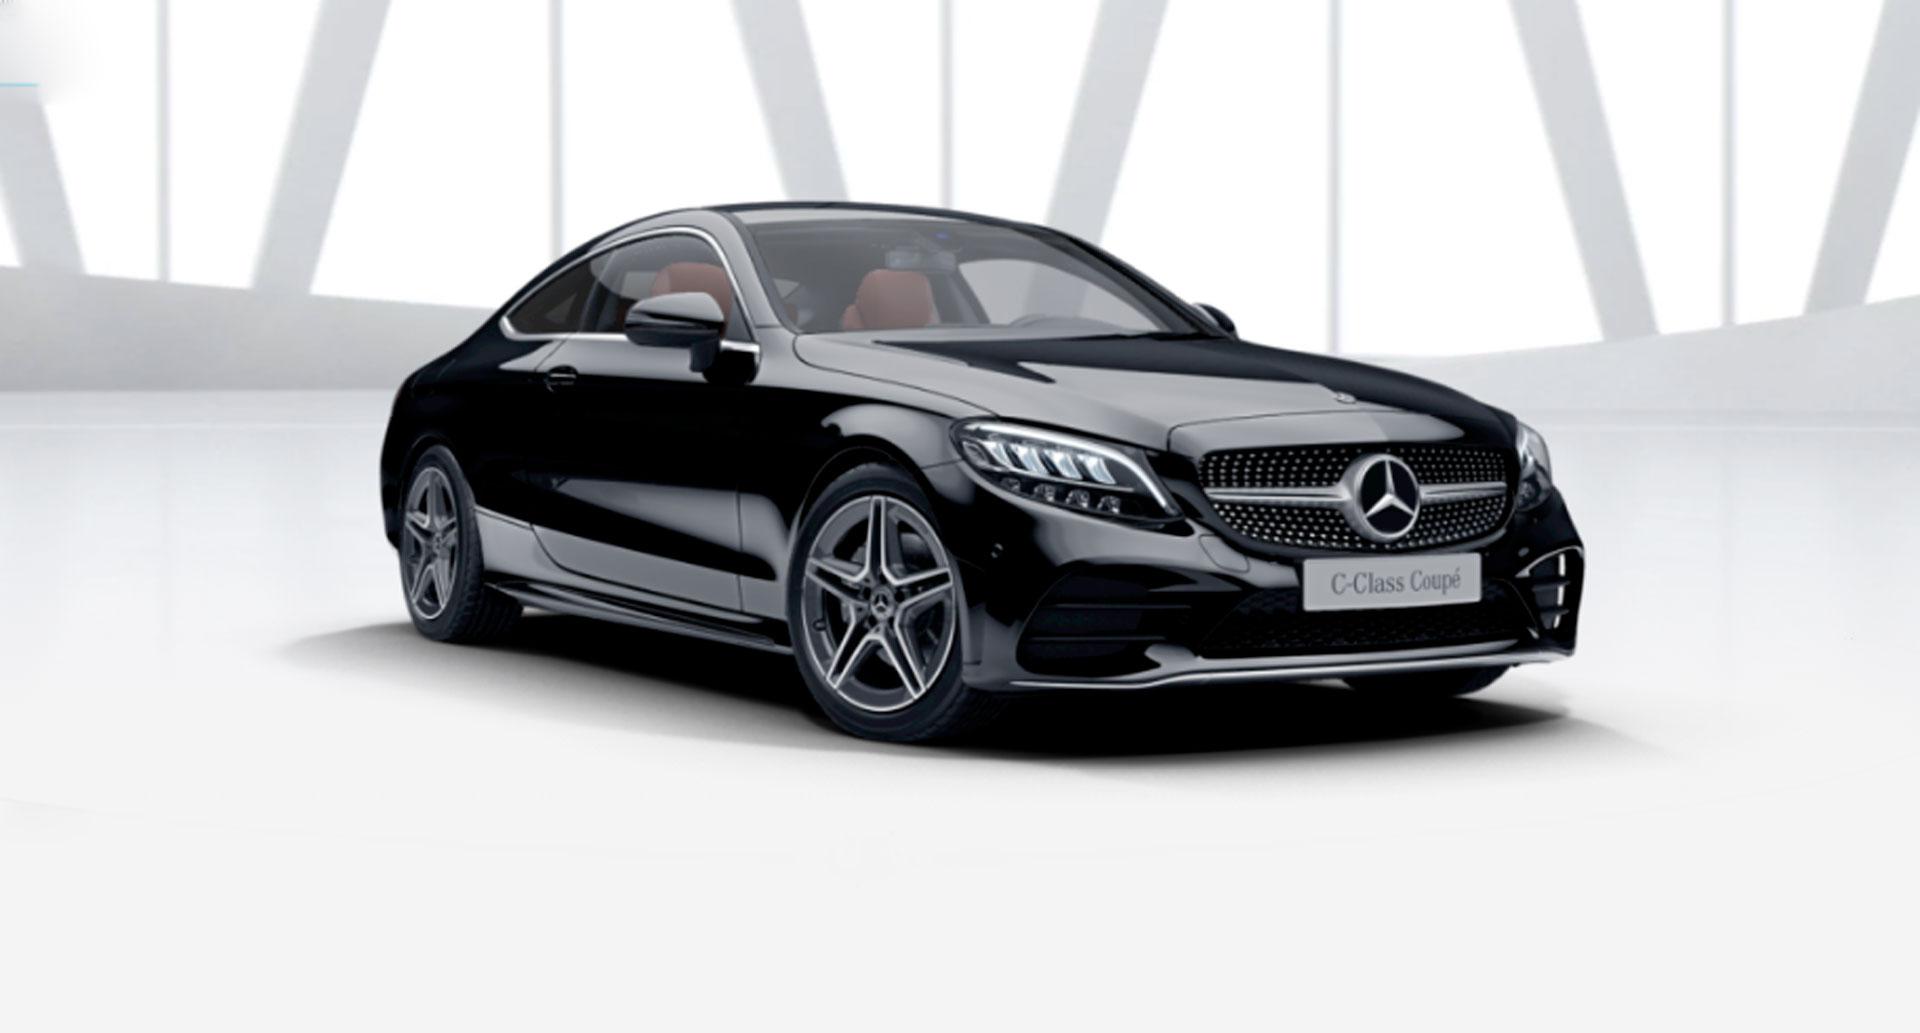 Mercedes-Benz C-Class Coupe 0152680066